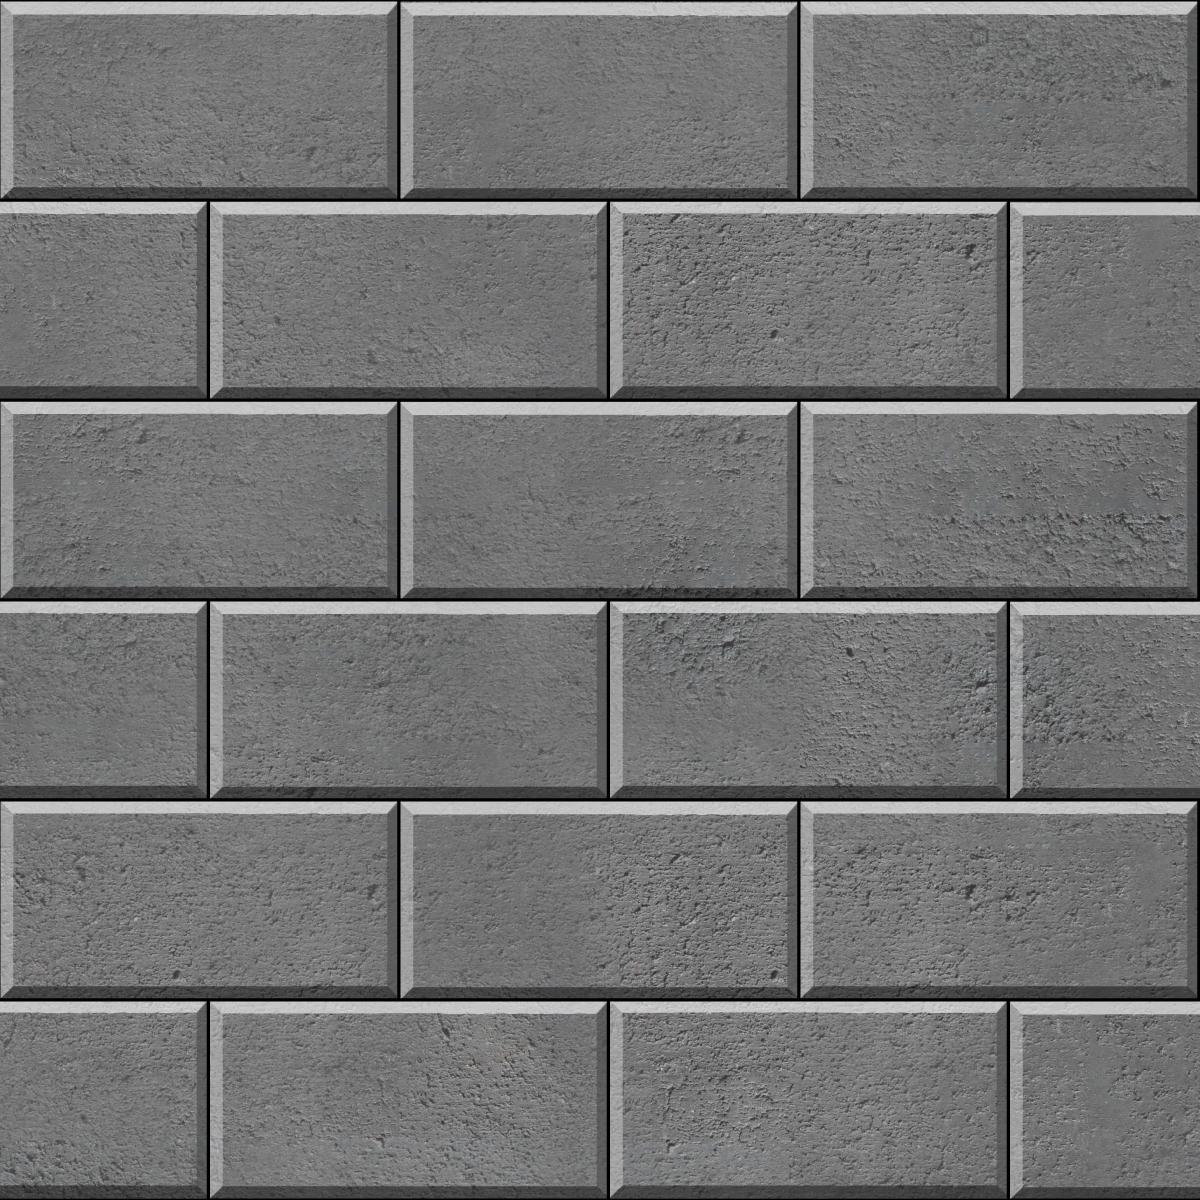 Stretcher Bond - Brick Bond (rectangle) Grey1200